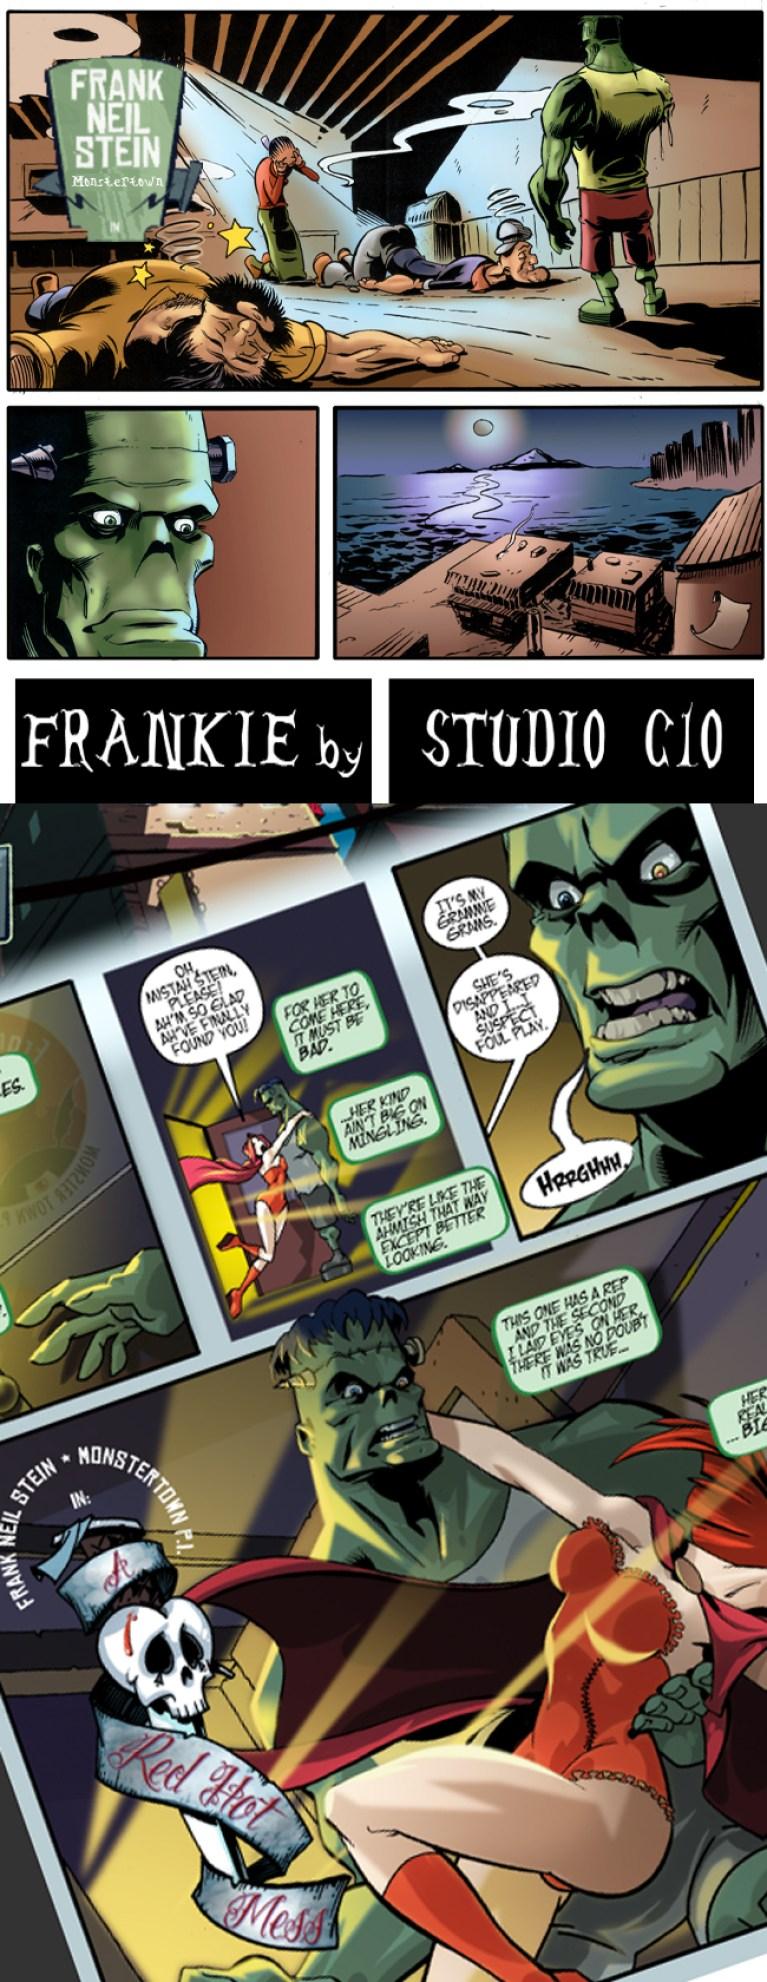 Frankenstein resucita de nuevo en Estudio C10